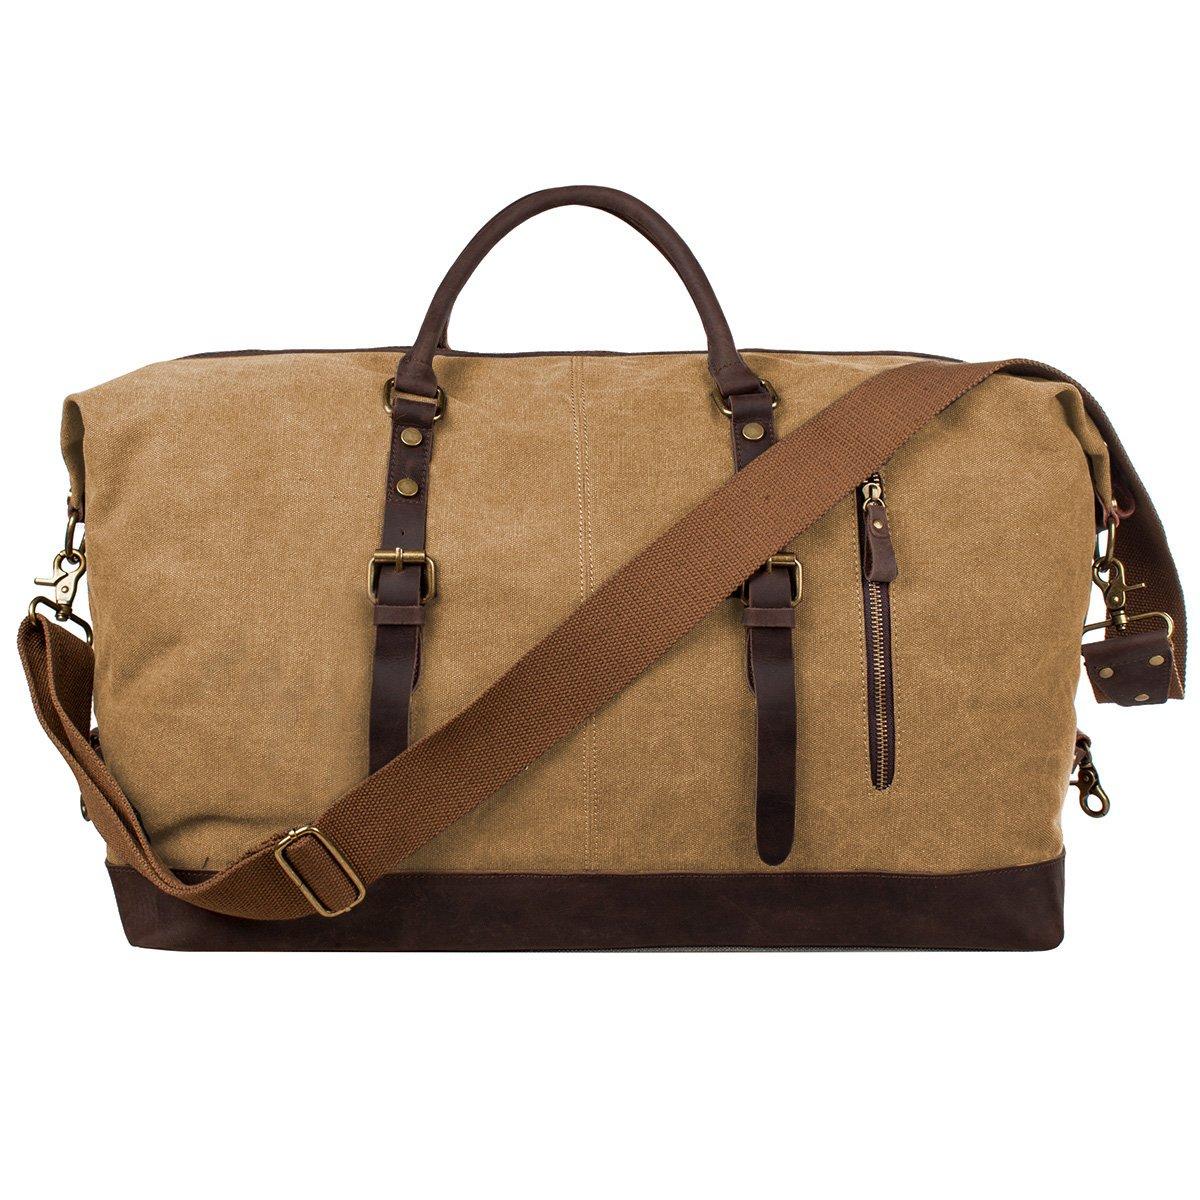 Oversized Travel Duffel Bag Waterproof Canvas Genuine Leather Weekend bag Weekender Overnight Carryon Hand Bag,Khaki